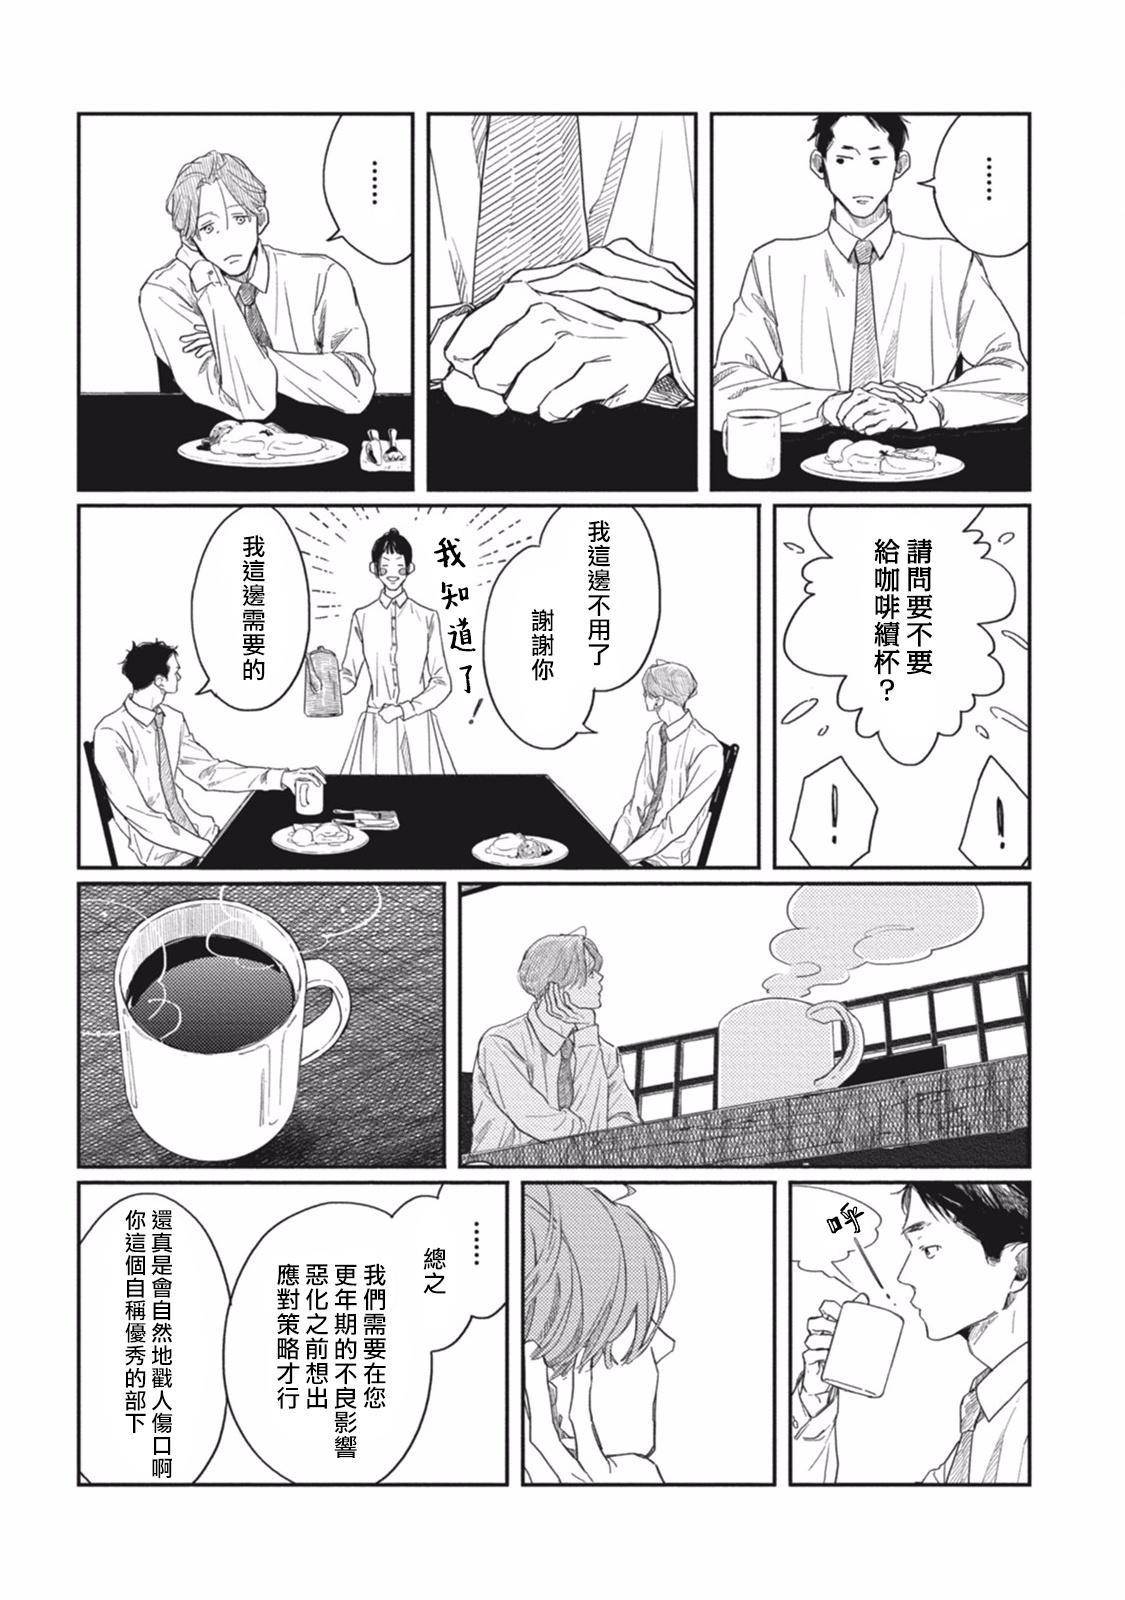 [Sagan Sagan] Old-fashioned Cupcake Ch. 1-2 [Chinese] [拾荒者汉化组] [Digital] 32